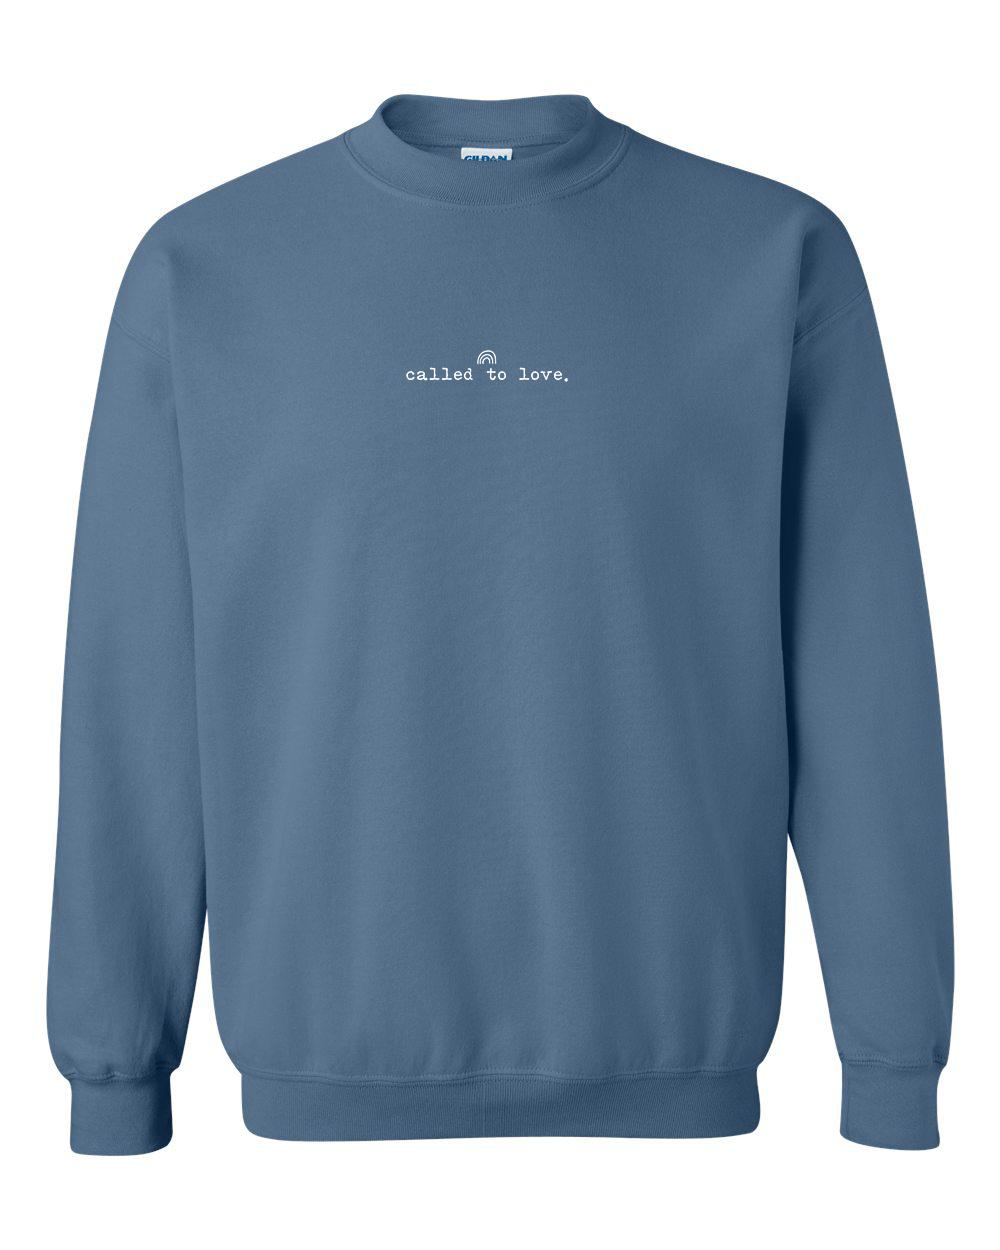 Gildan 18000 - Heavy Blend 8 oz., 50/50 Fleece Crewneck Sweatshirt